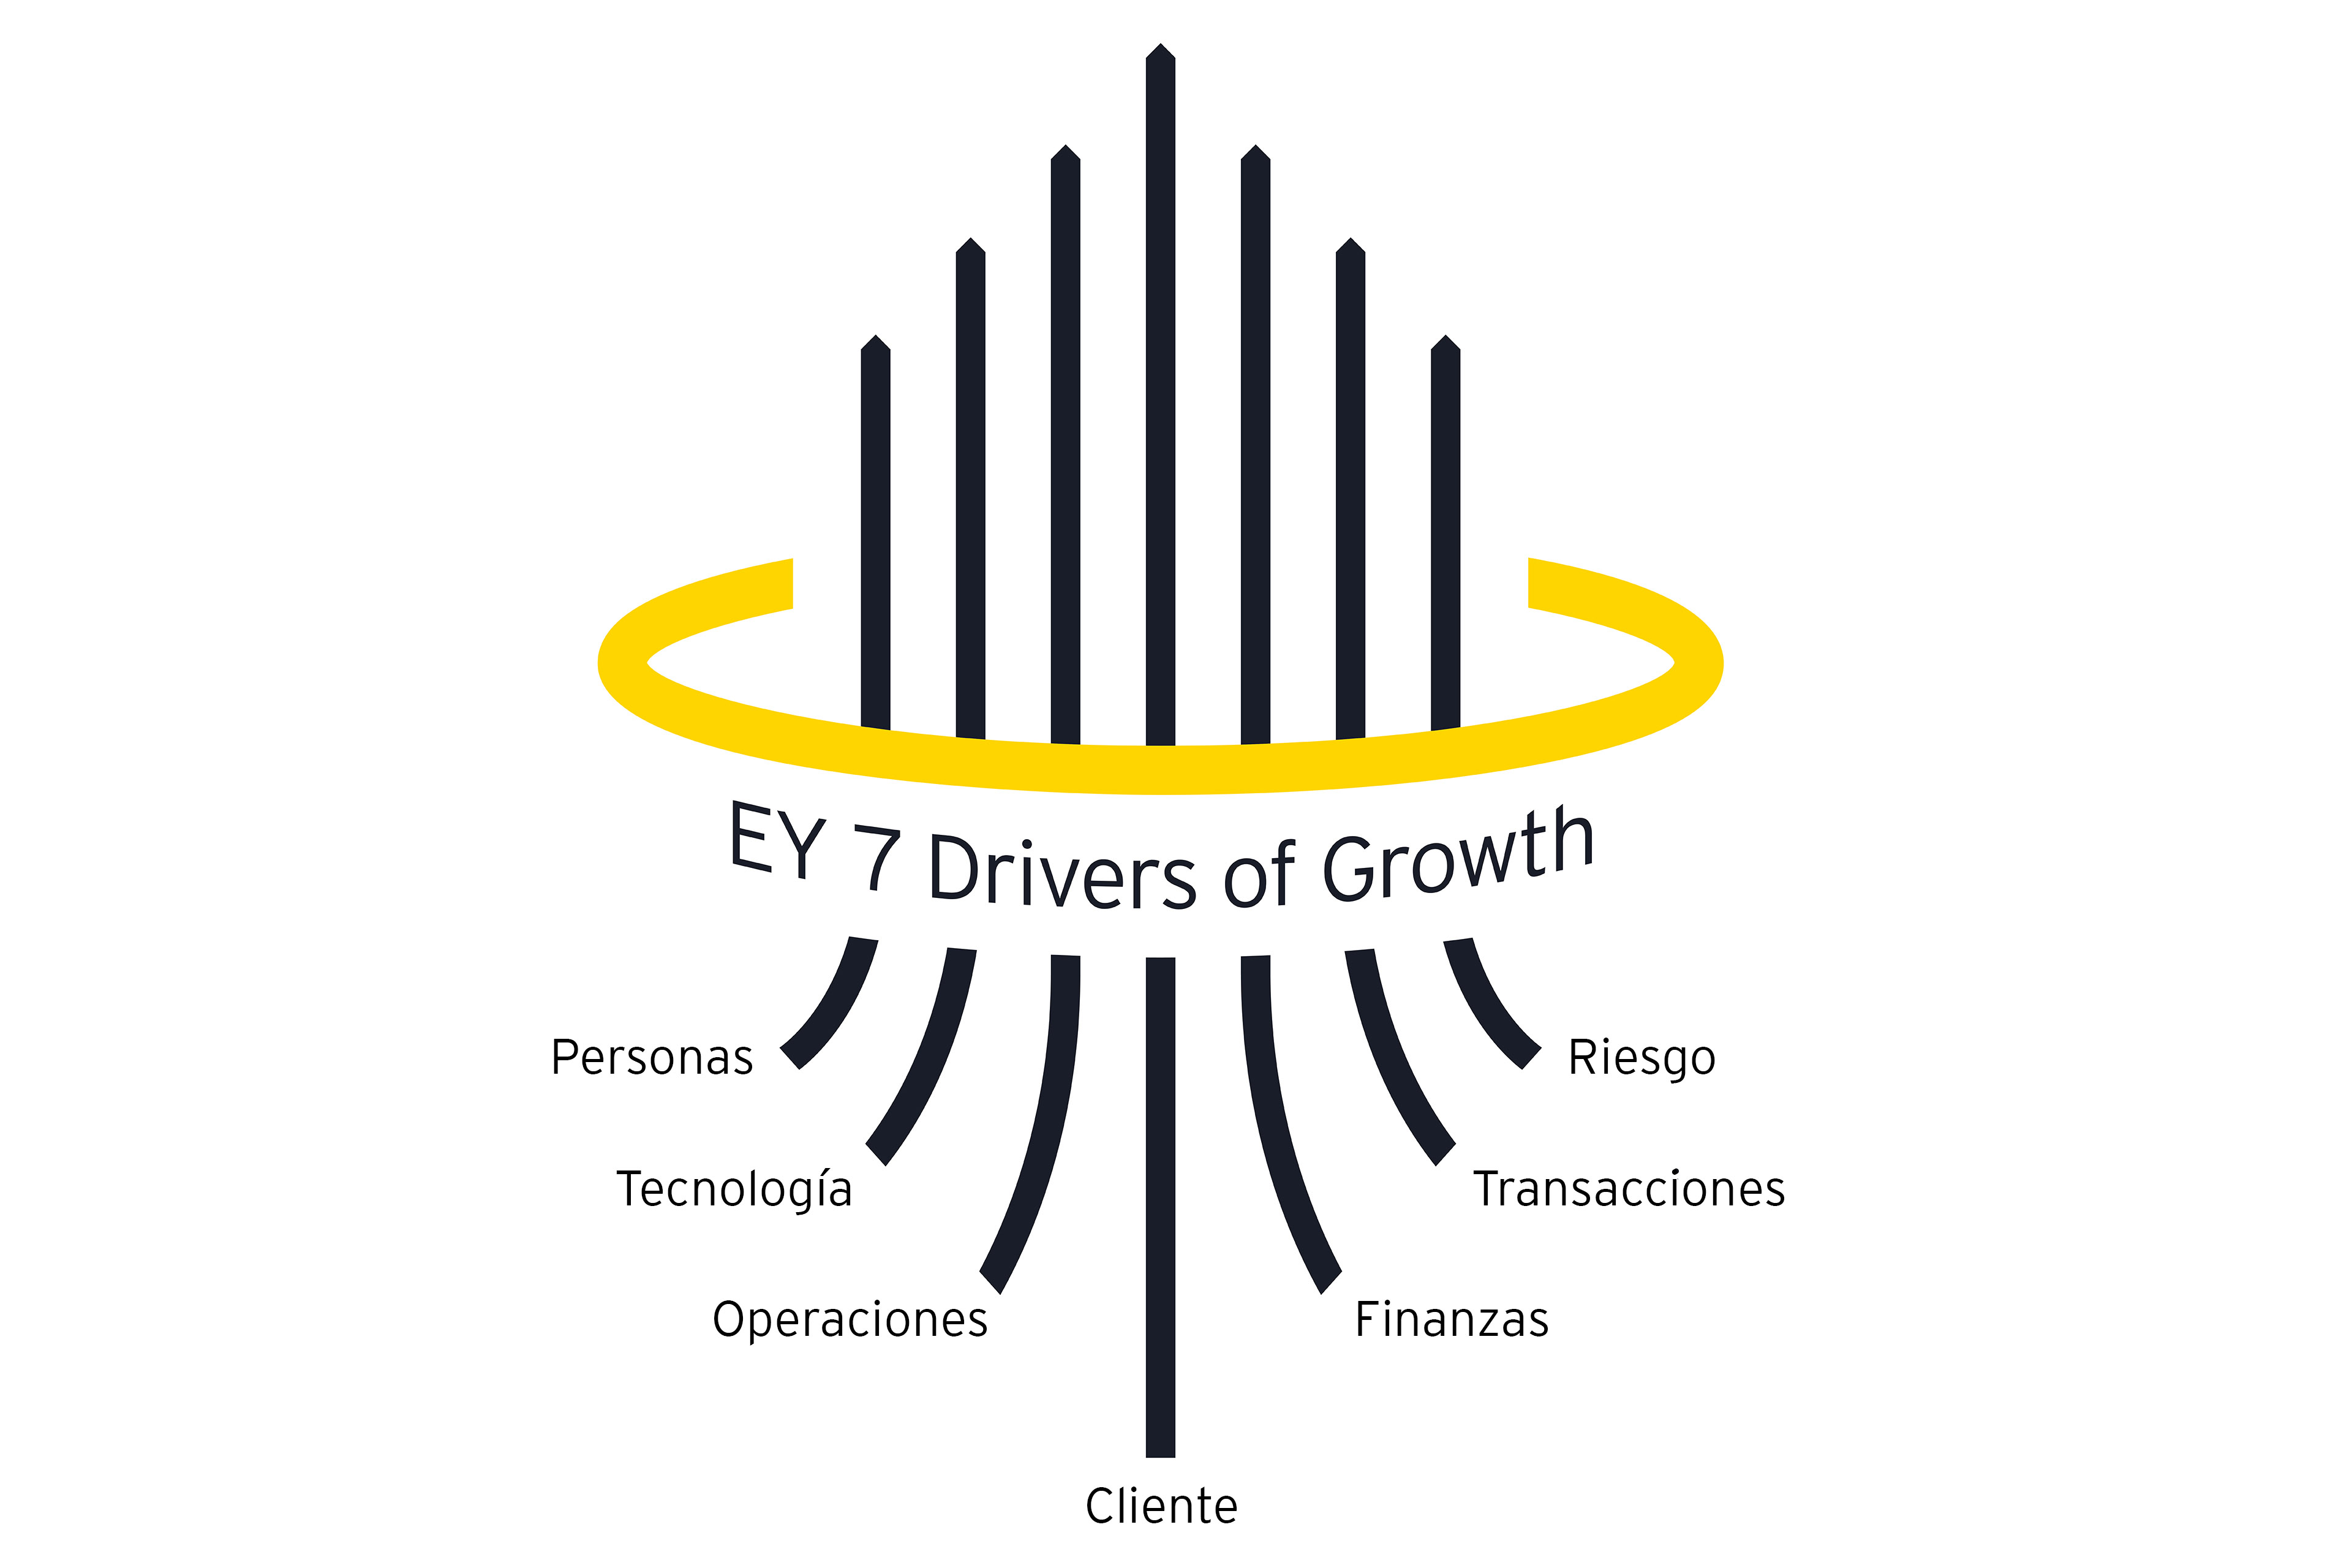 Infografía de EY 7 Drivers of Growth